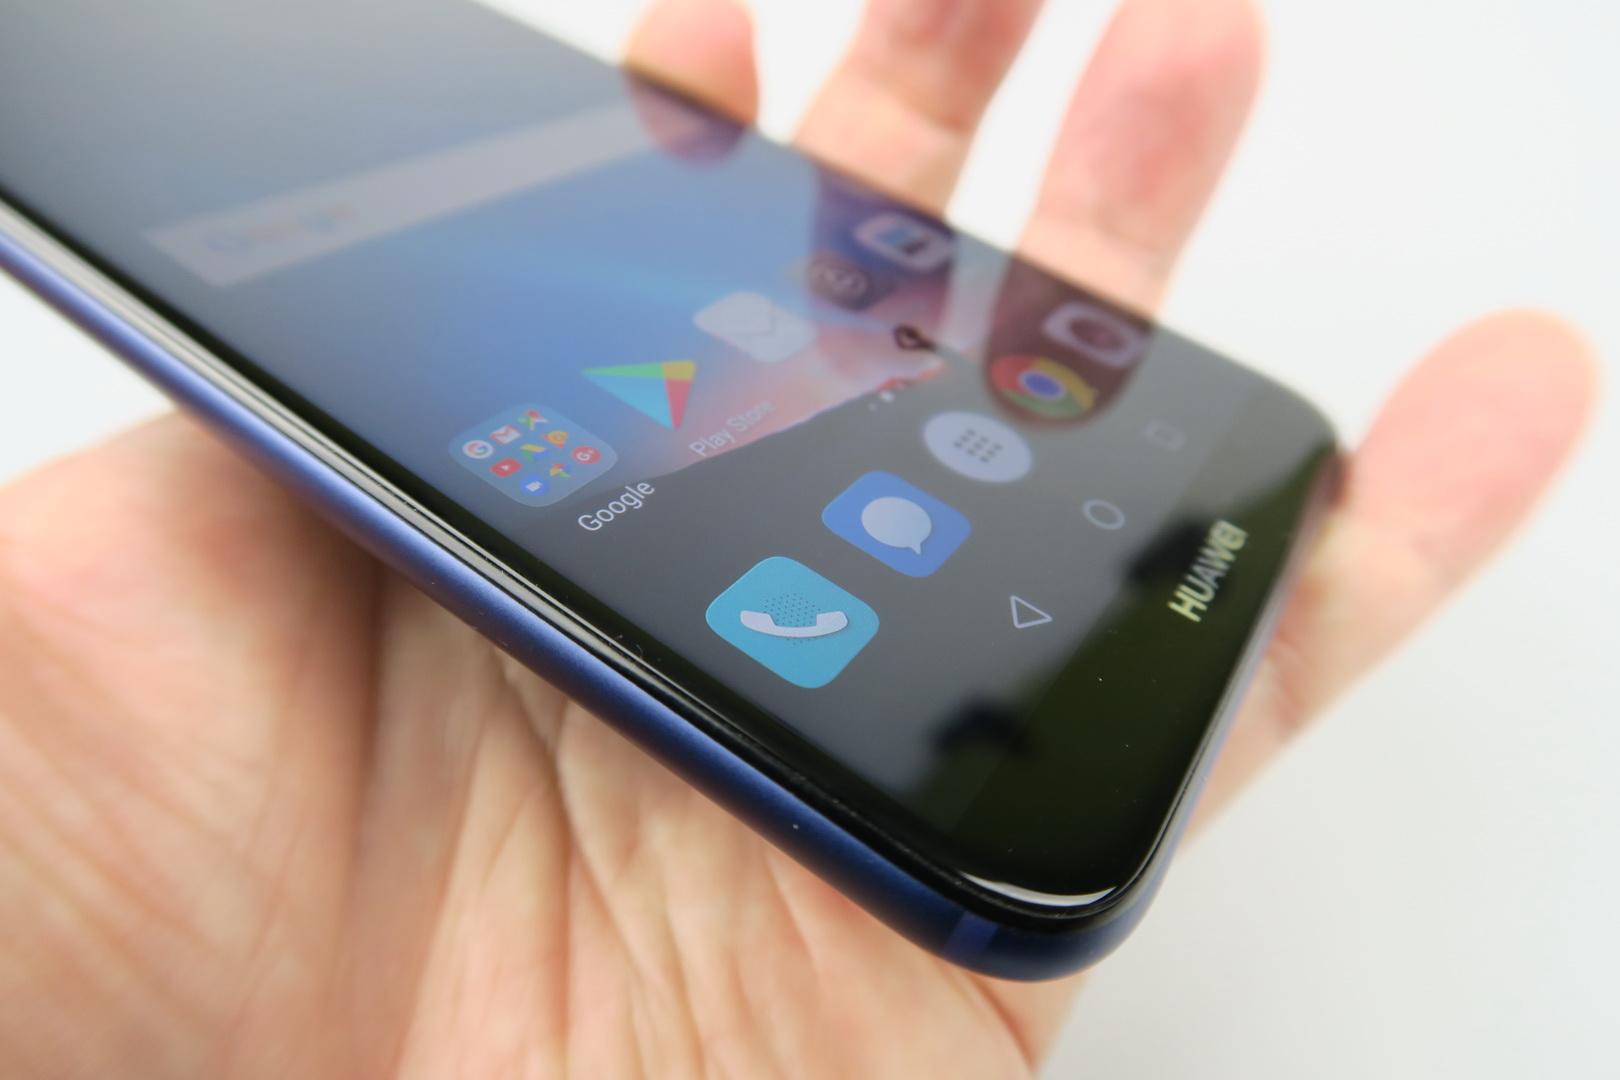 Huawei Mate 10 Lite Review: More of a Selfie Phone, More ...